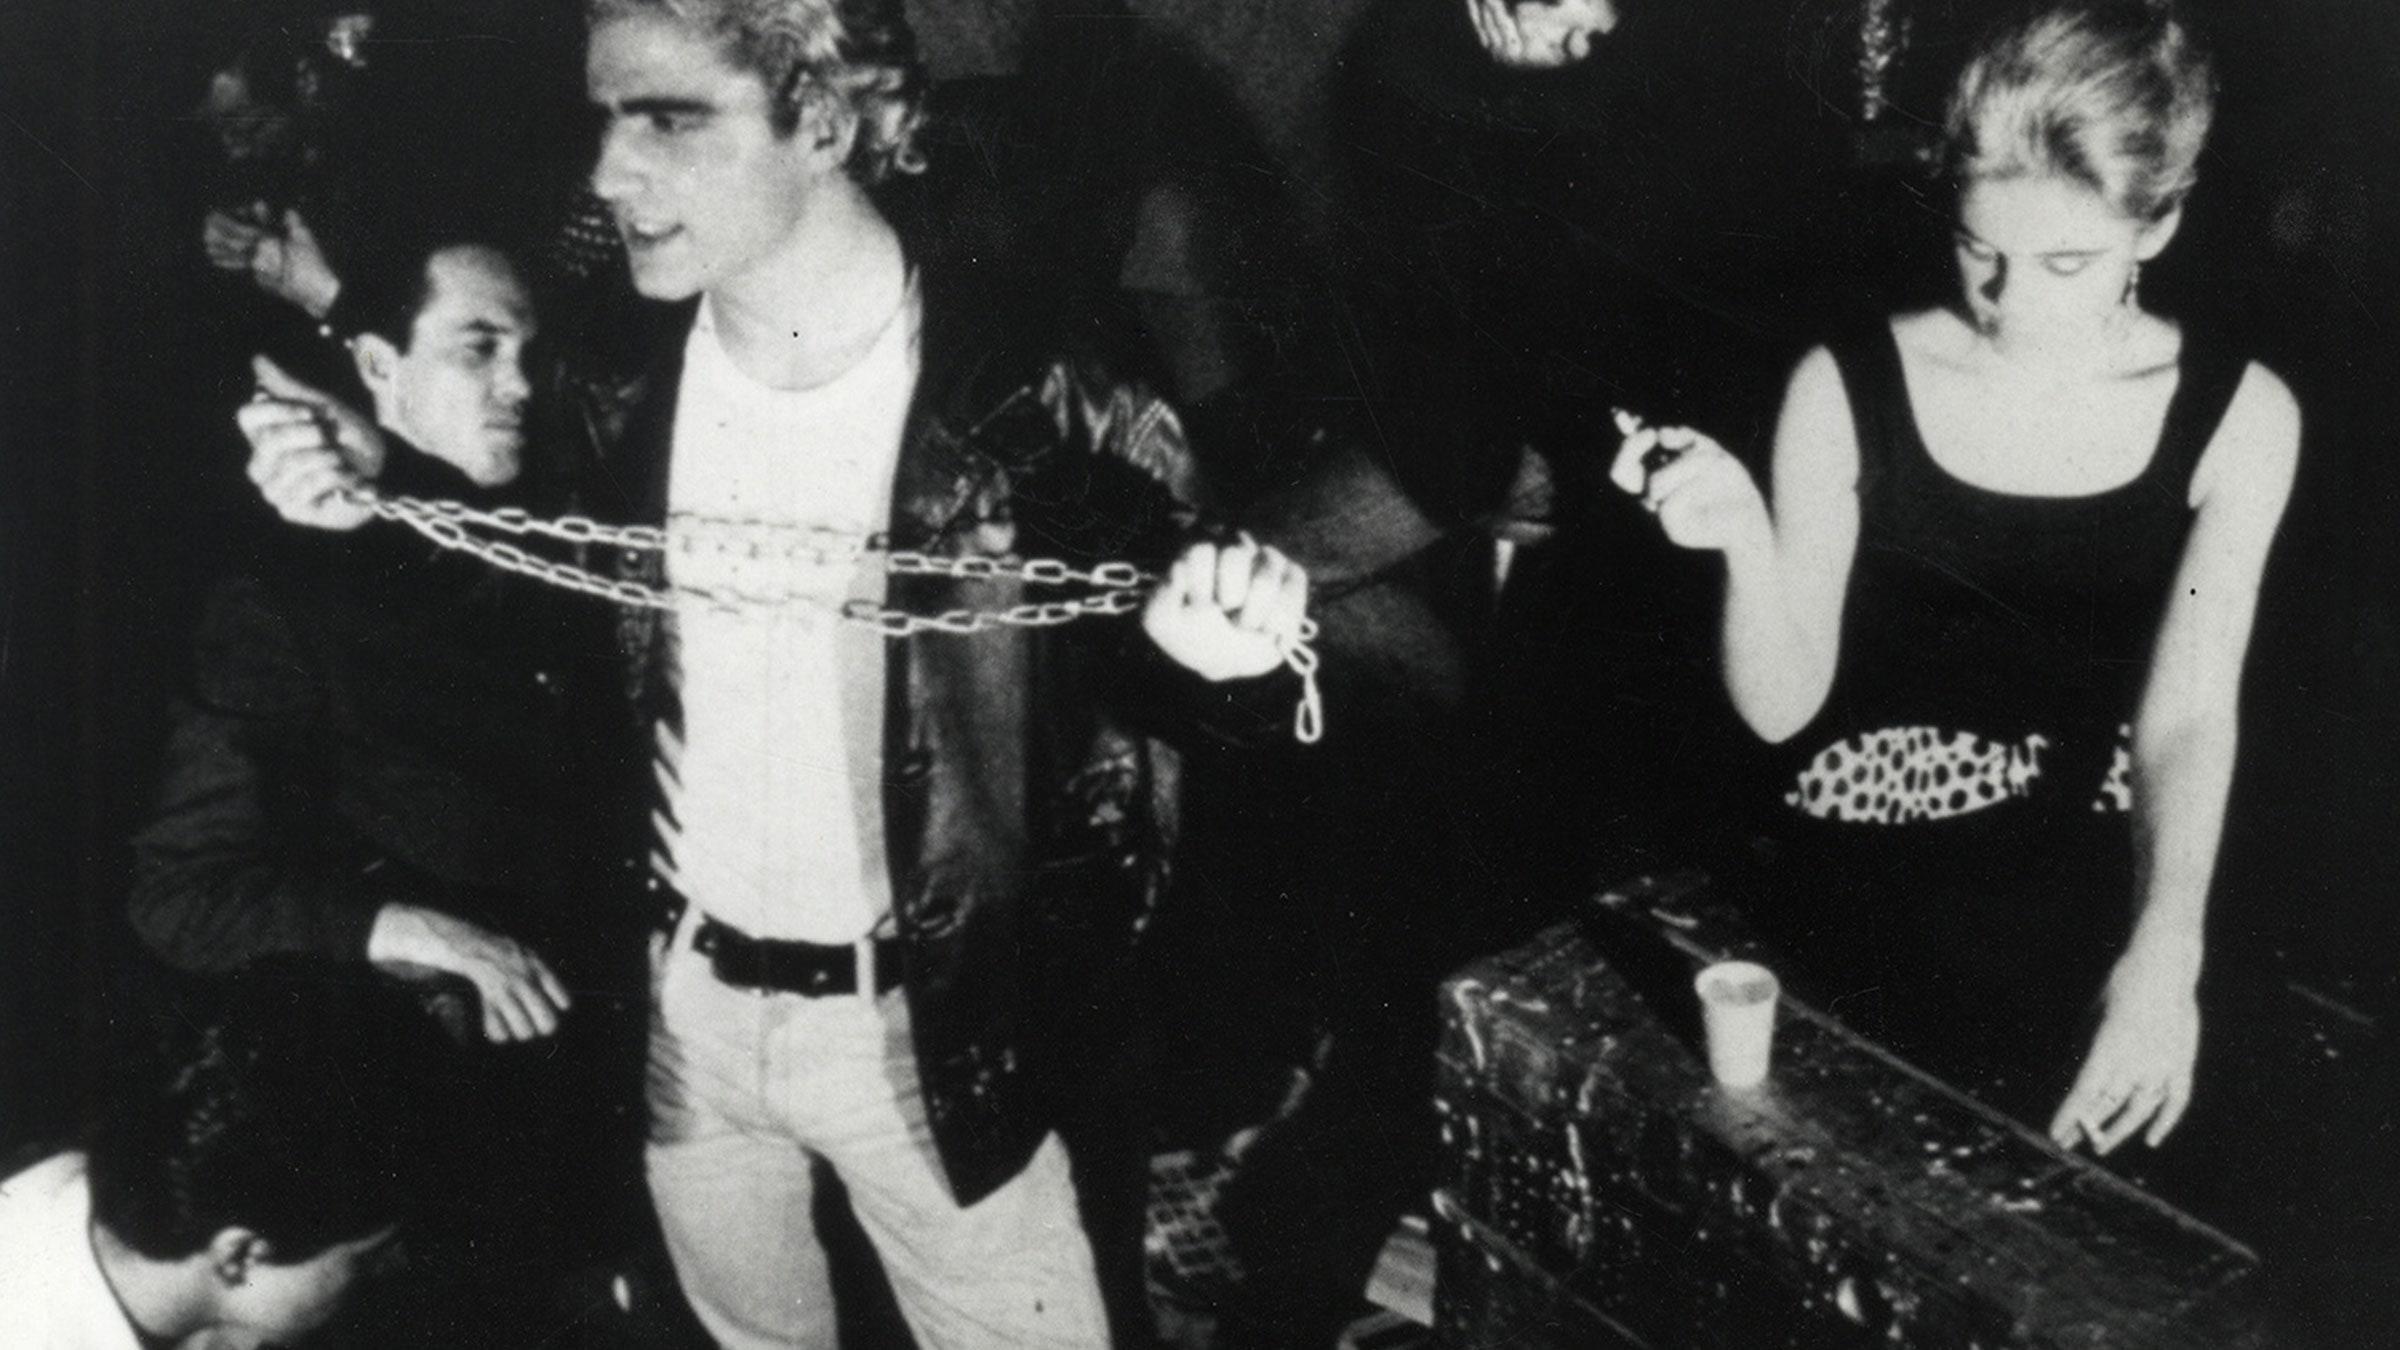 Yeraltından Filmler<br/>Andy Warhol + Lou Reed